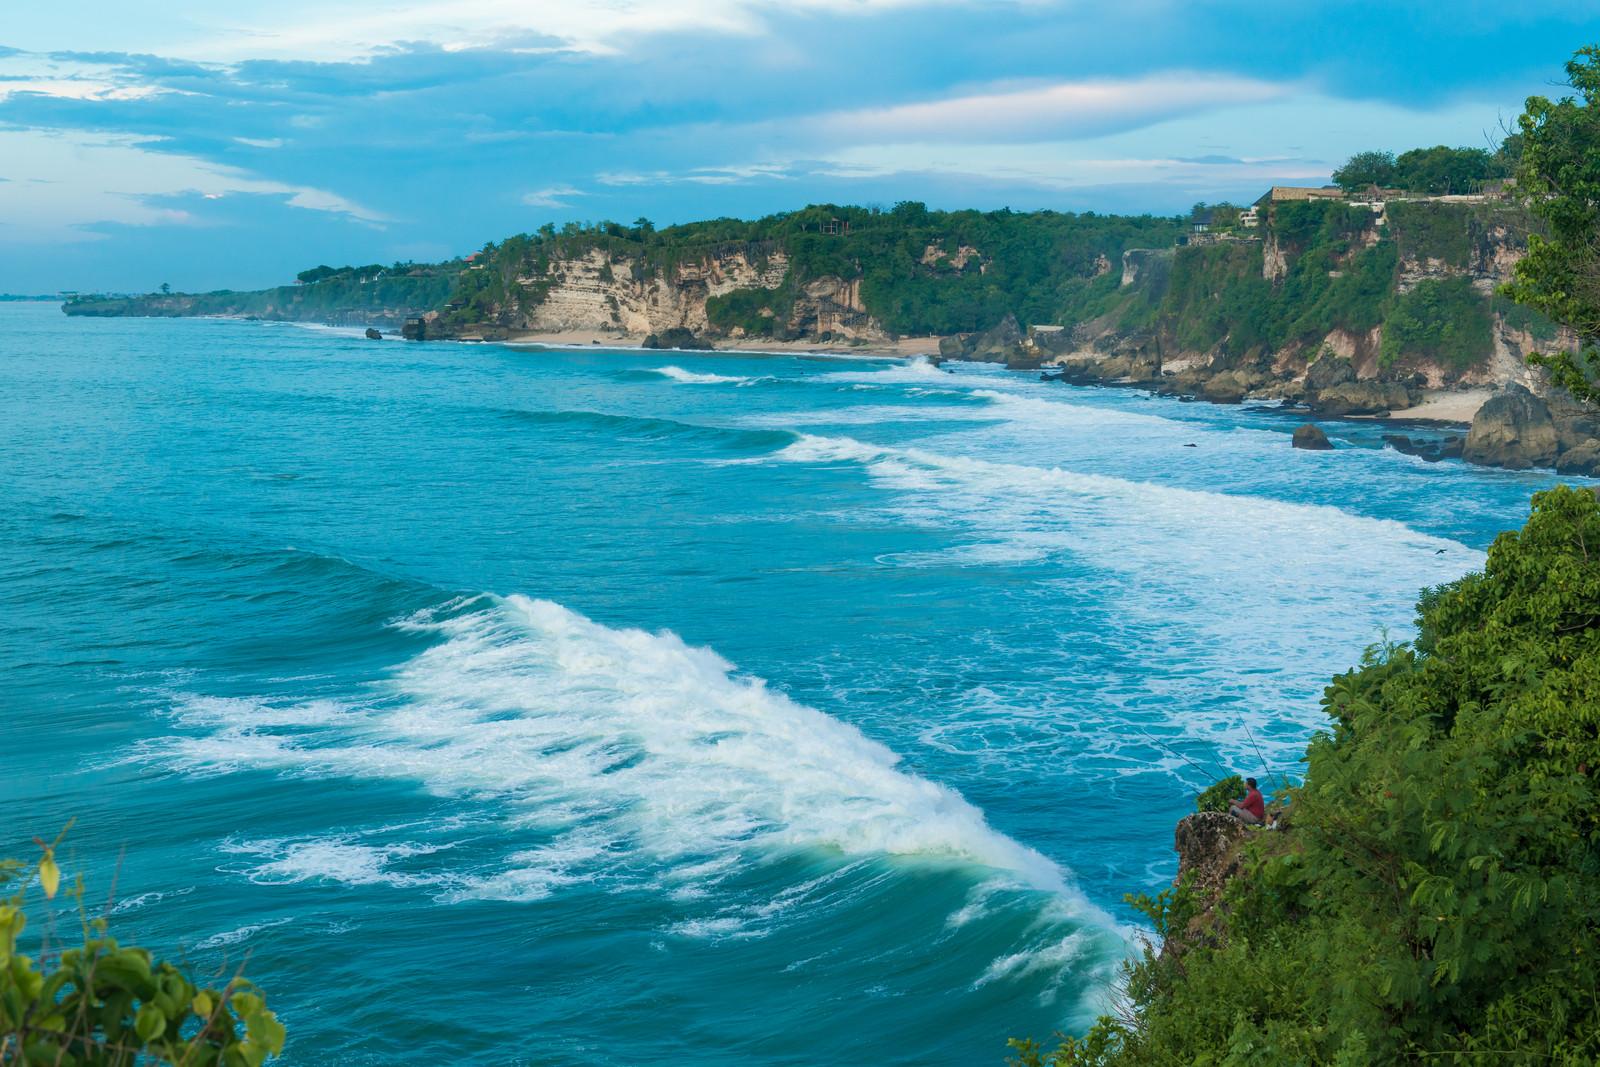 Bali crystal water at island's crust